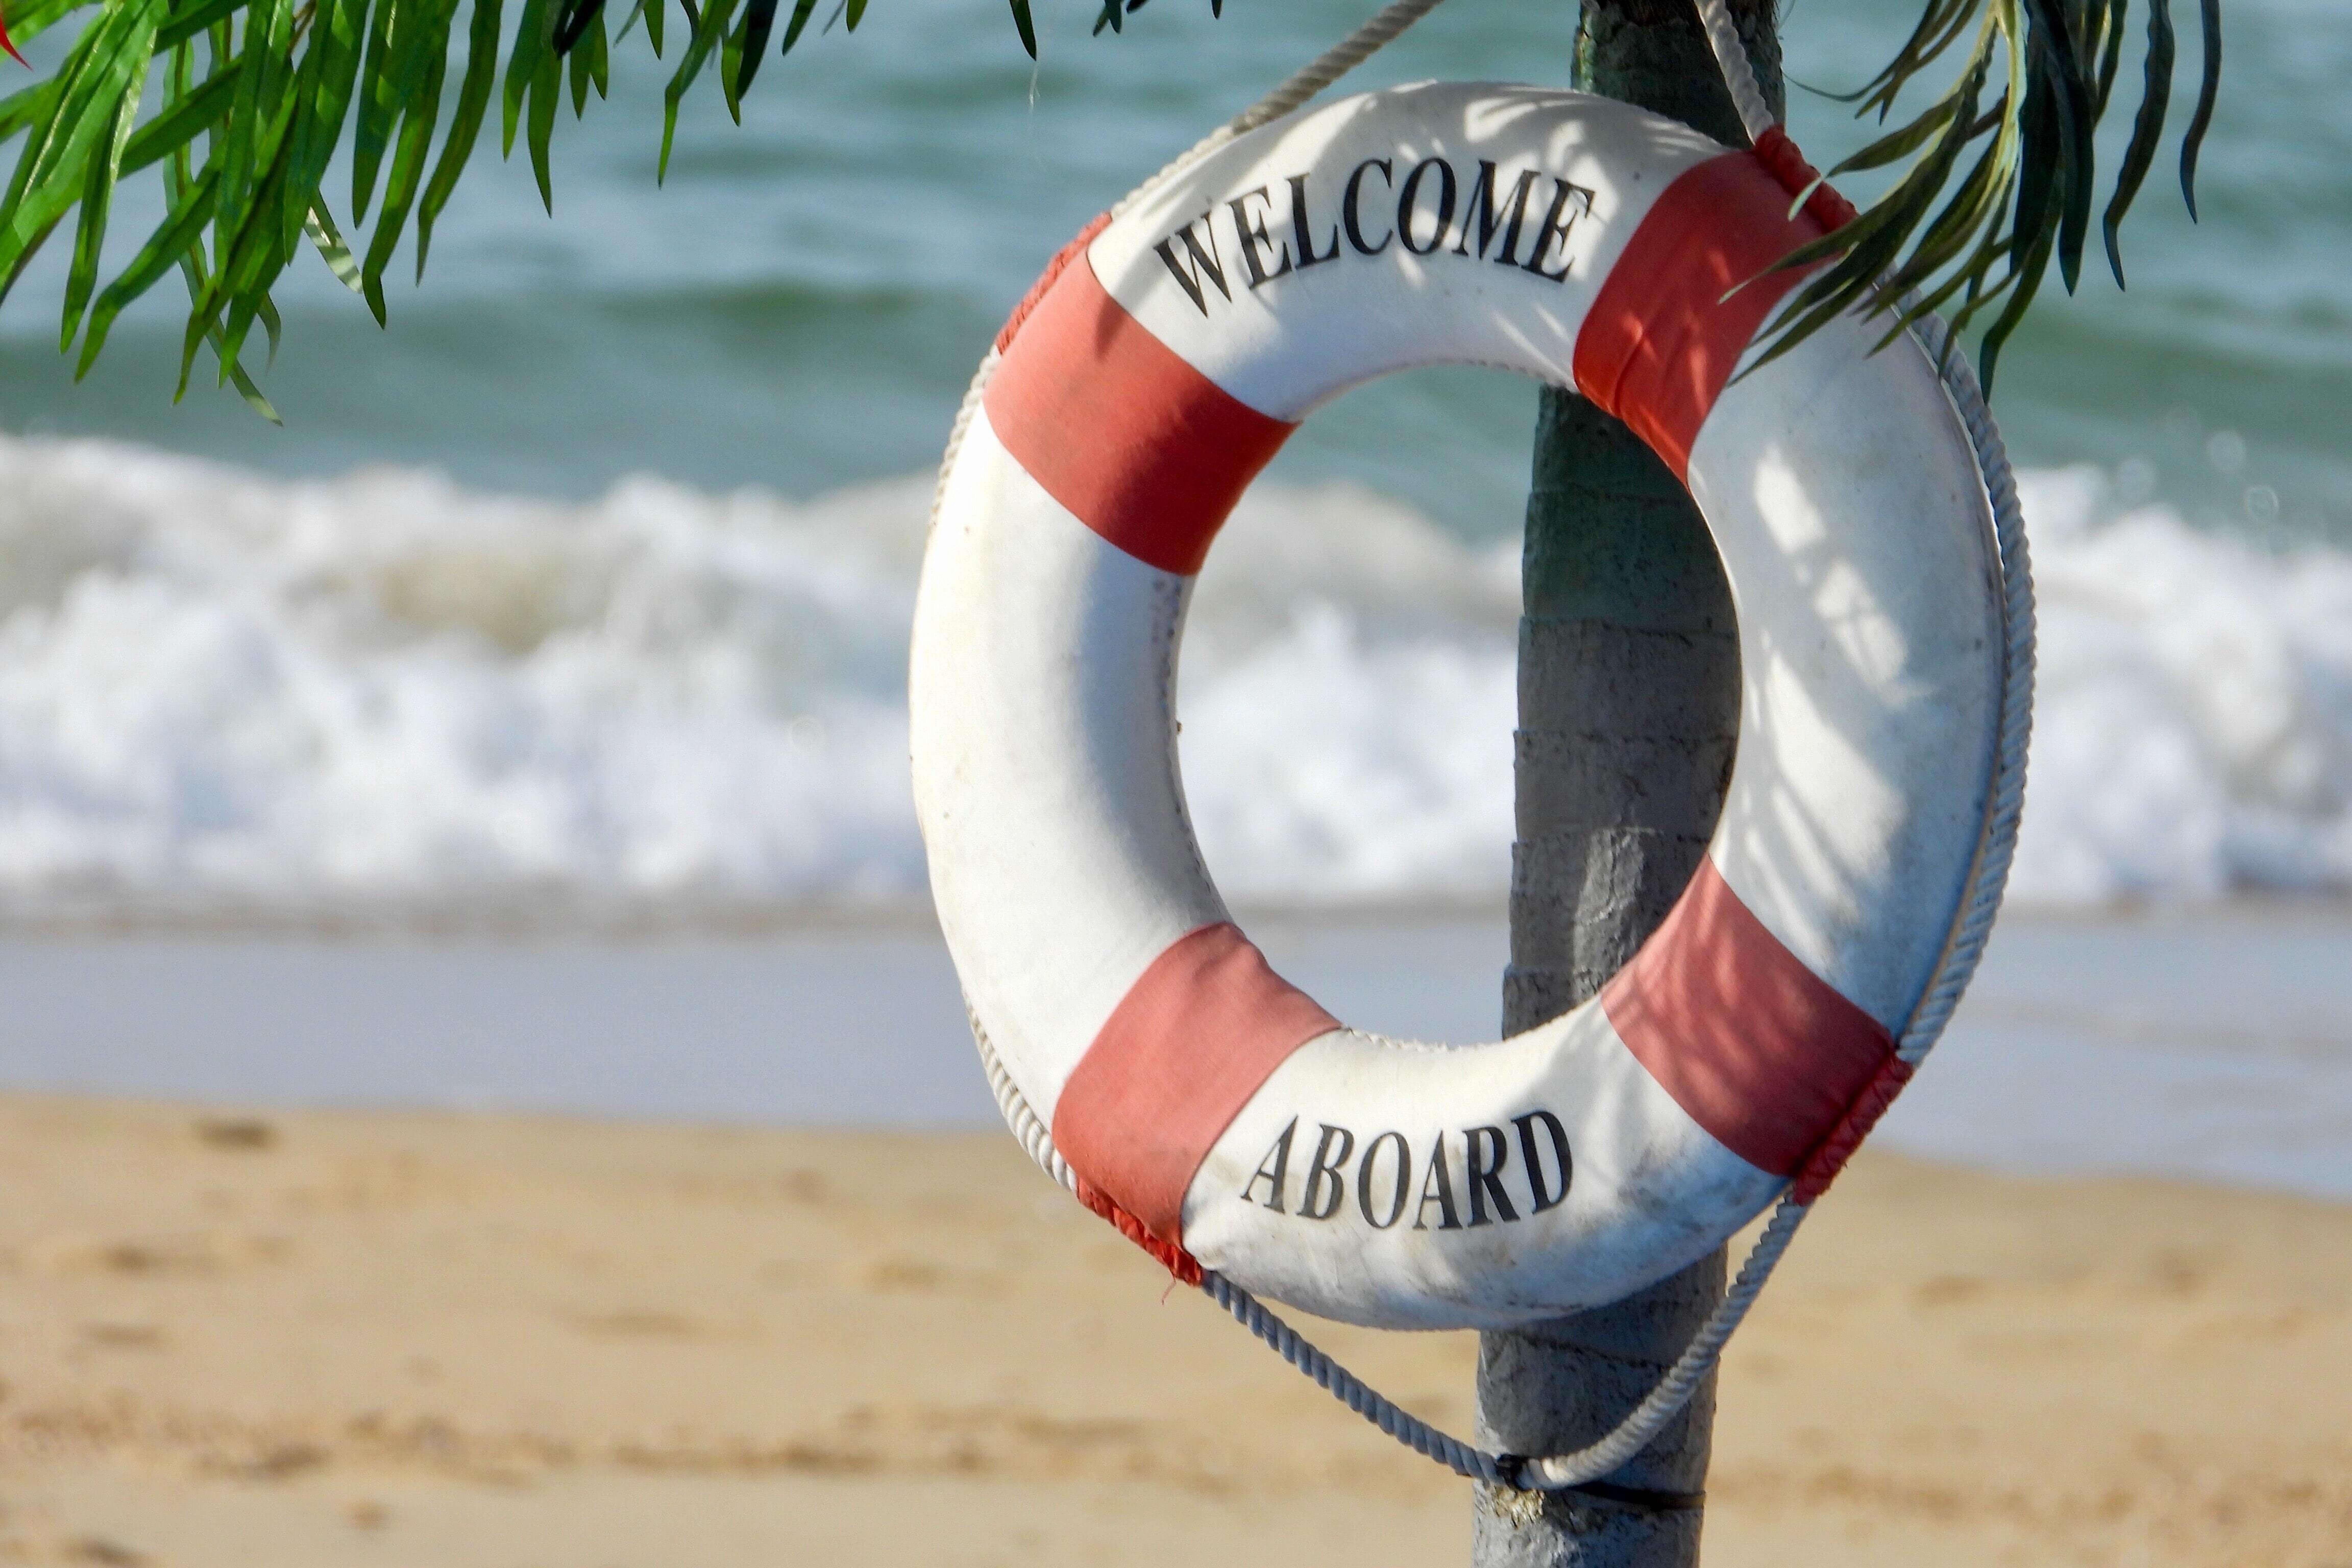 Welcome Aboard Rettungsring